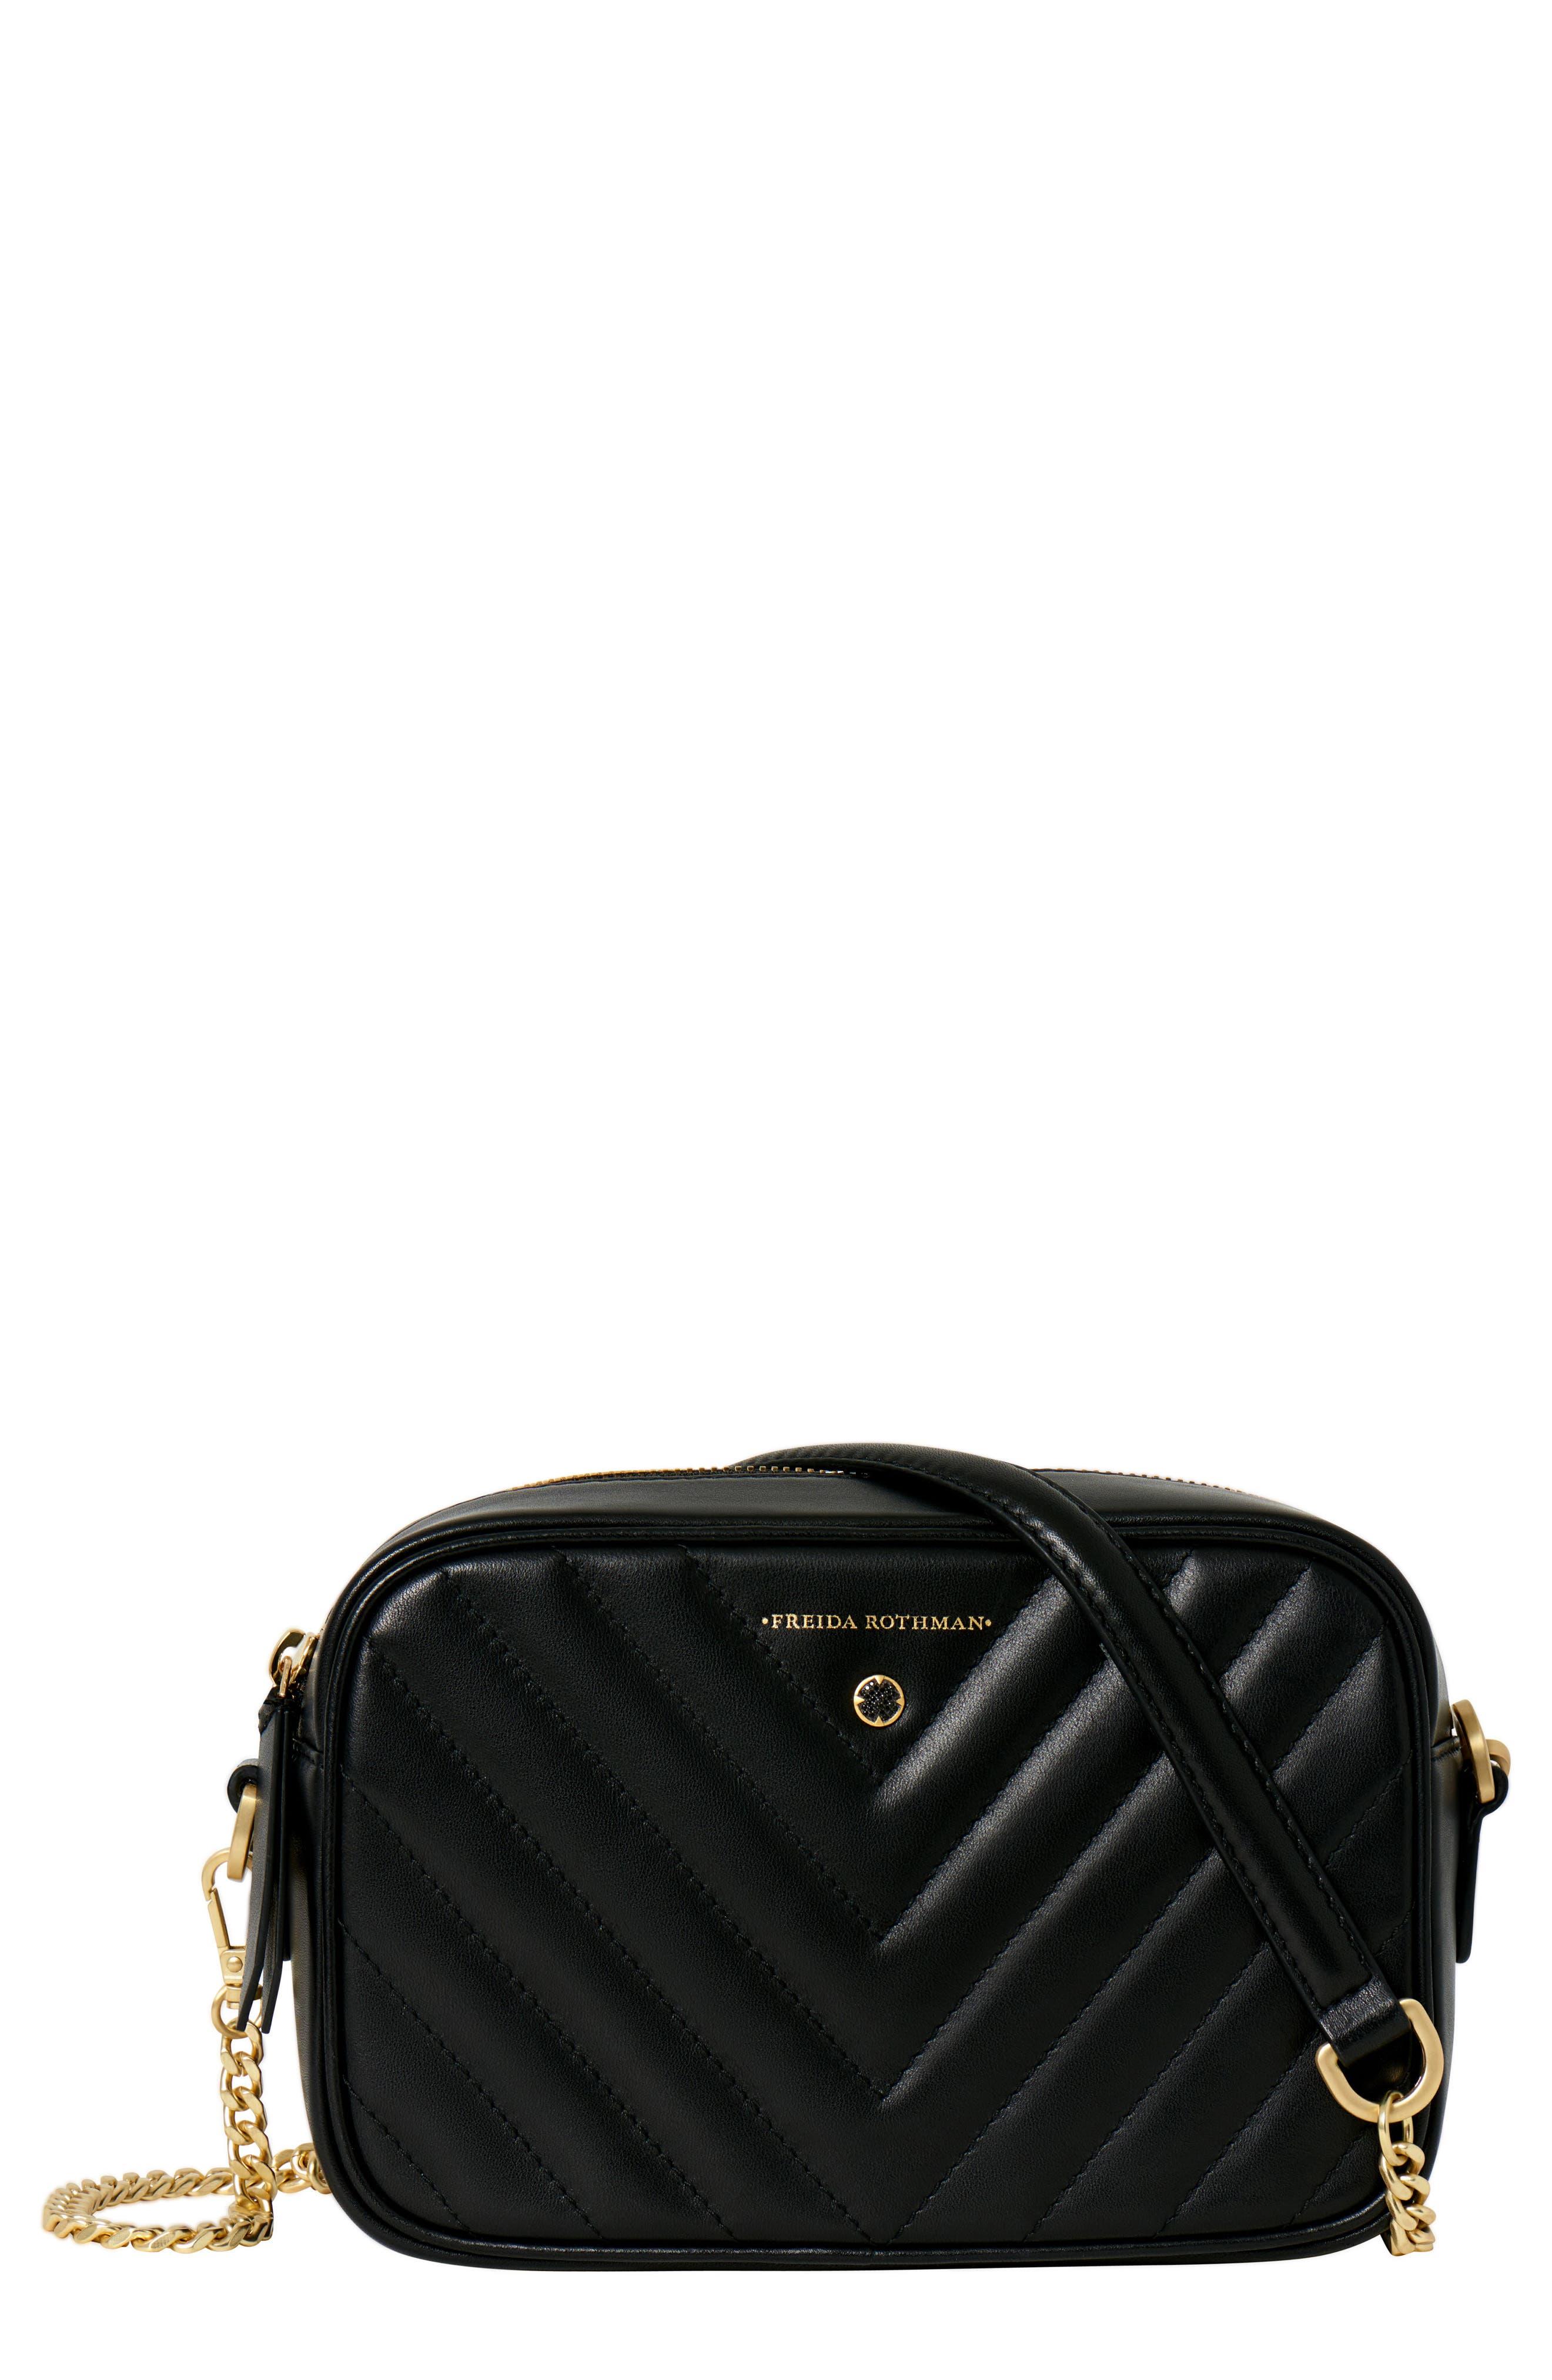 Lexington Quilted Leather Camera Bag,                             Main thumbnail 1, color,                             BLACK